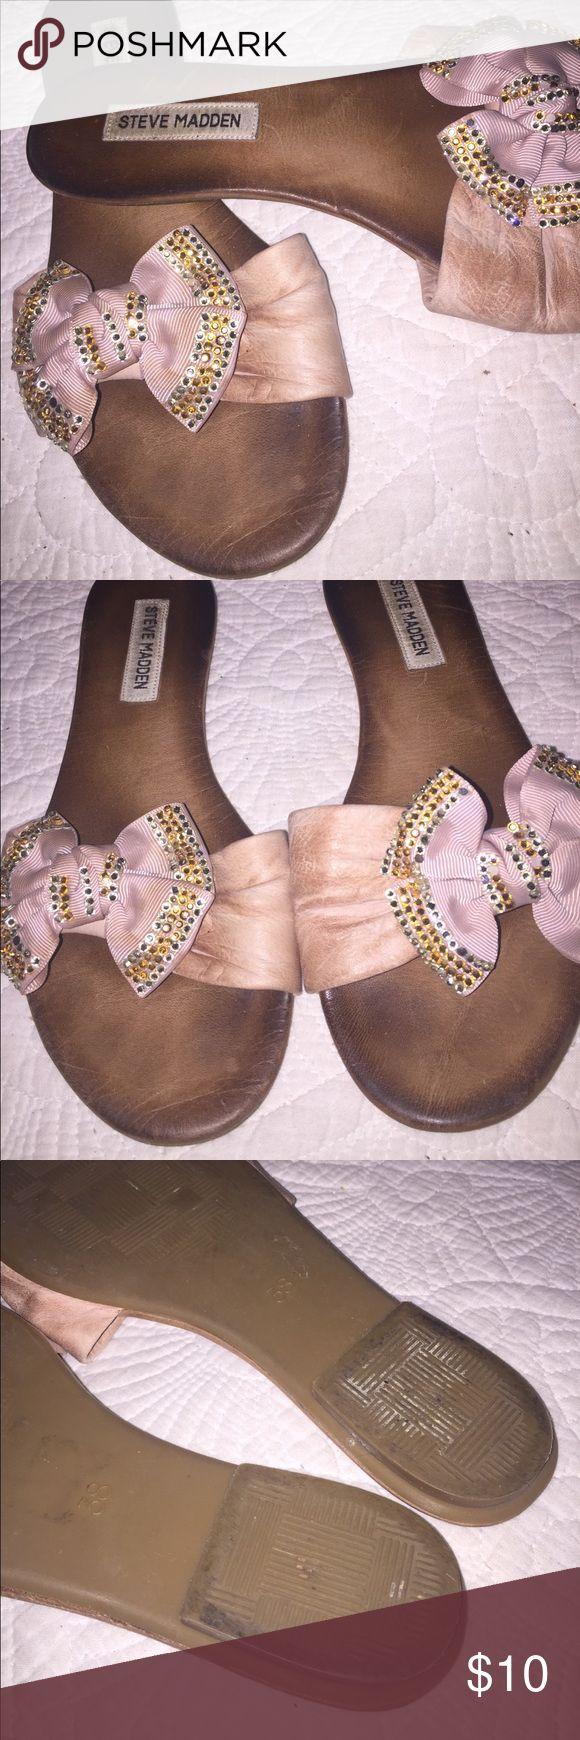 Steve Madden Bow Flip Flops Used but still lots of life yet. Super comfy Steve Madden Shoes Flats & Loafers